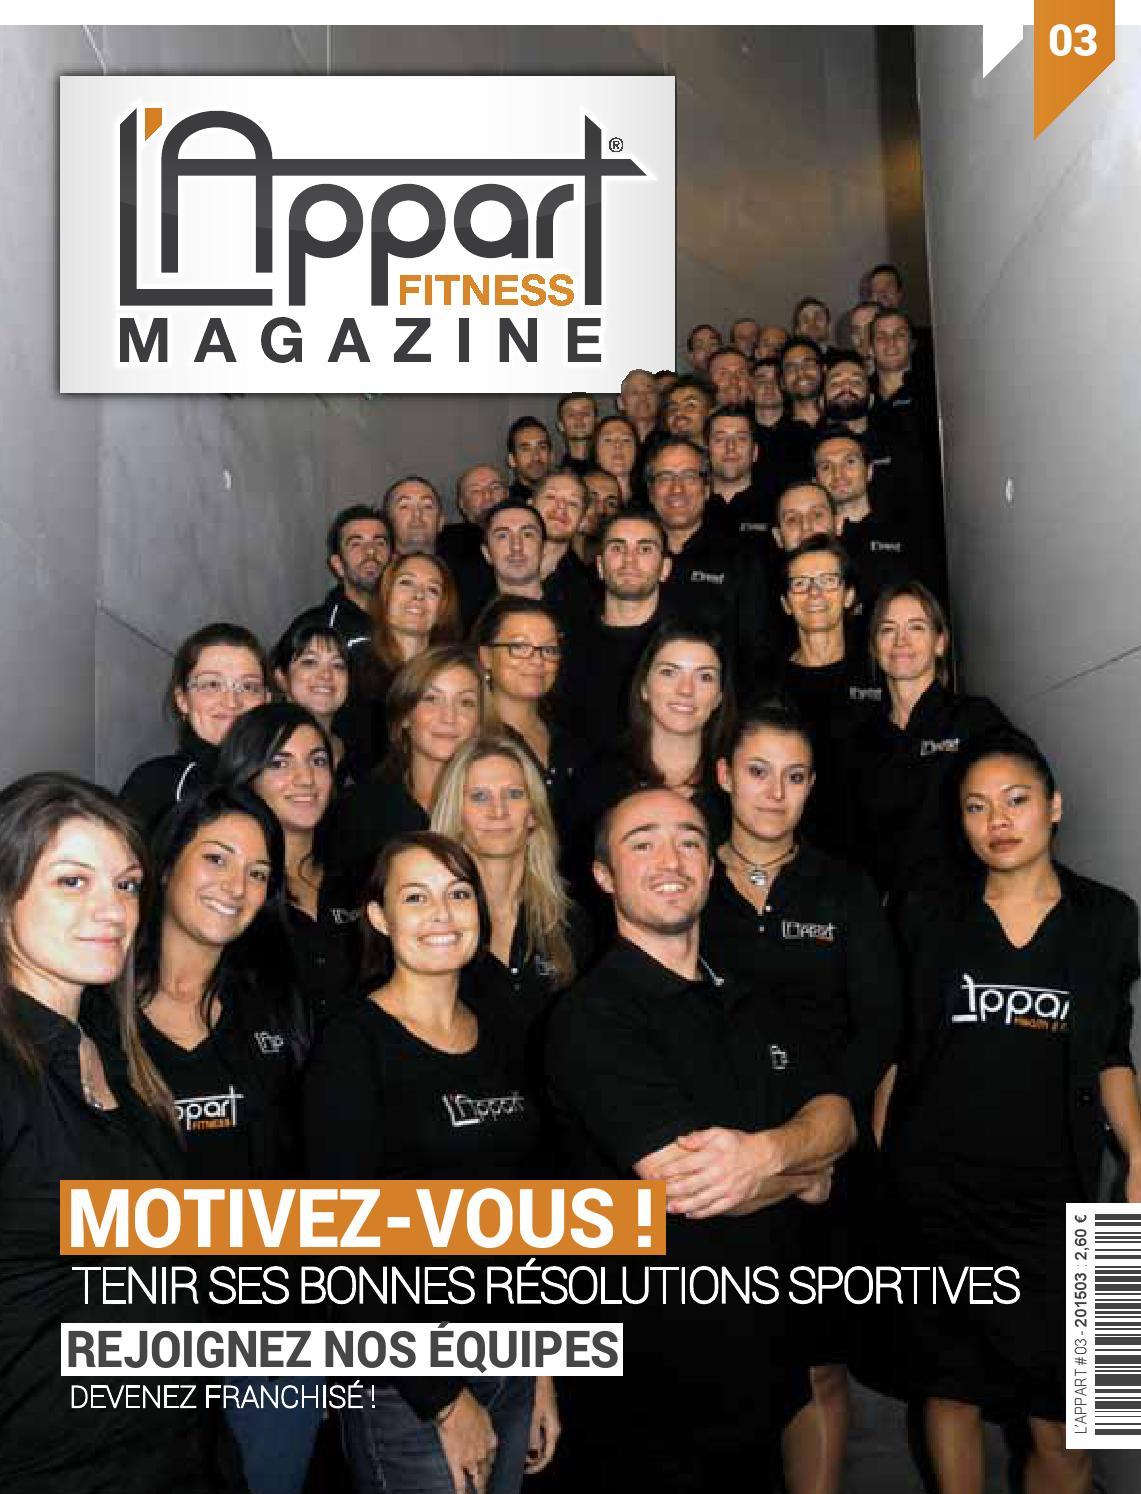 l 39 appart fitness magazine 03 by mog design issuu. Black Bedroom Furniture Sets. Home Design Ideas